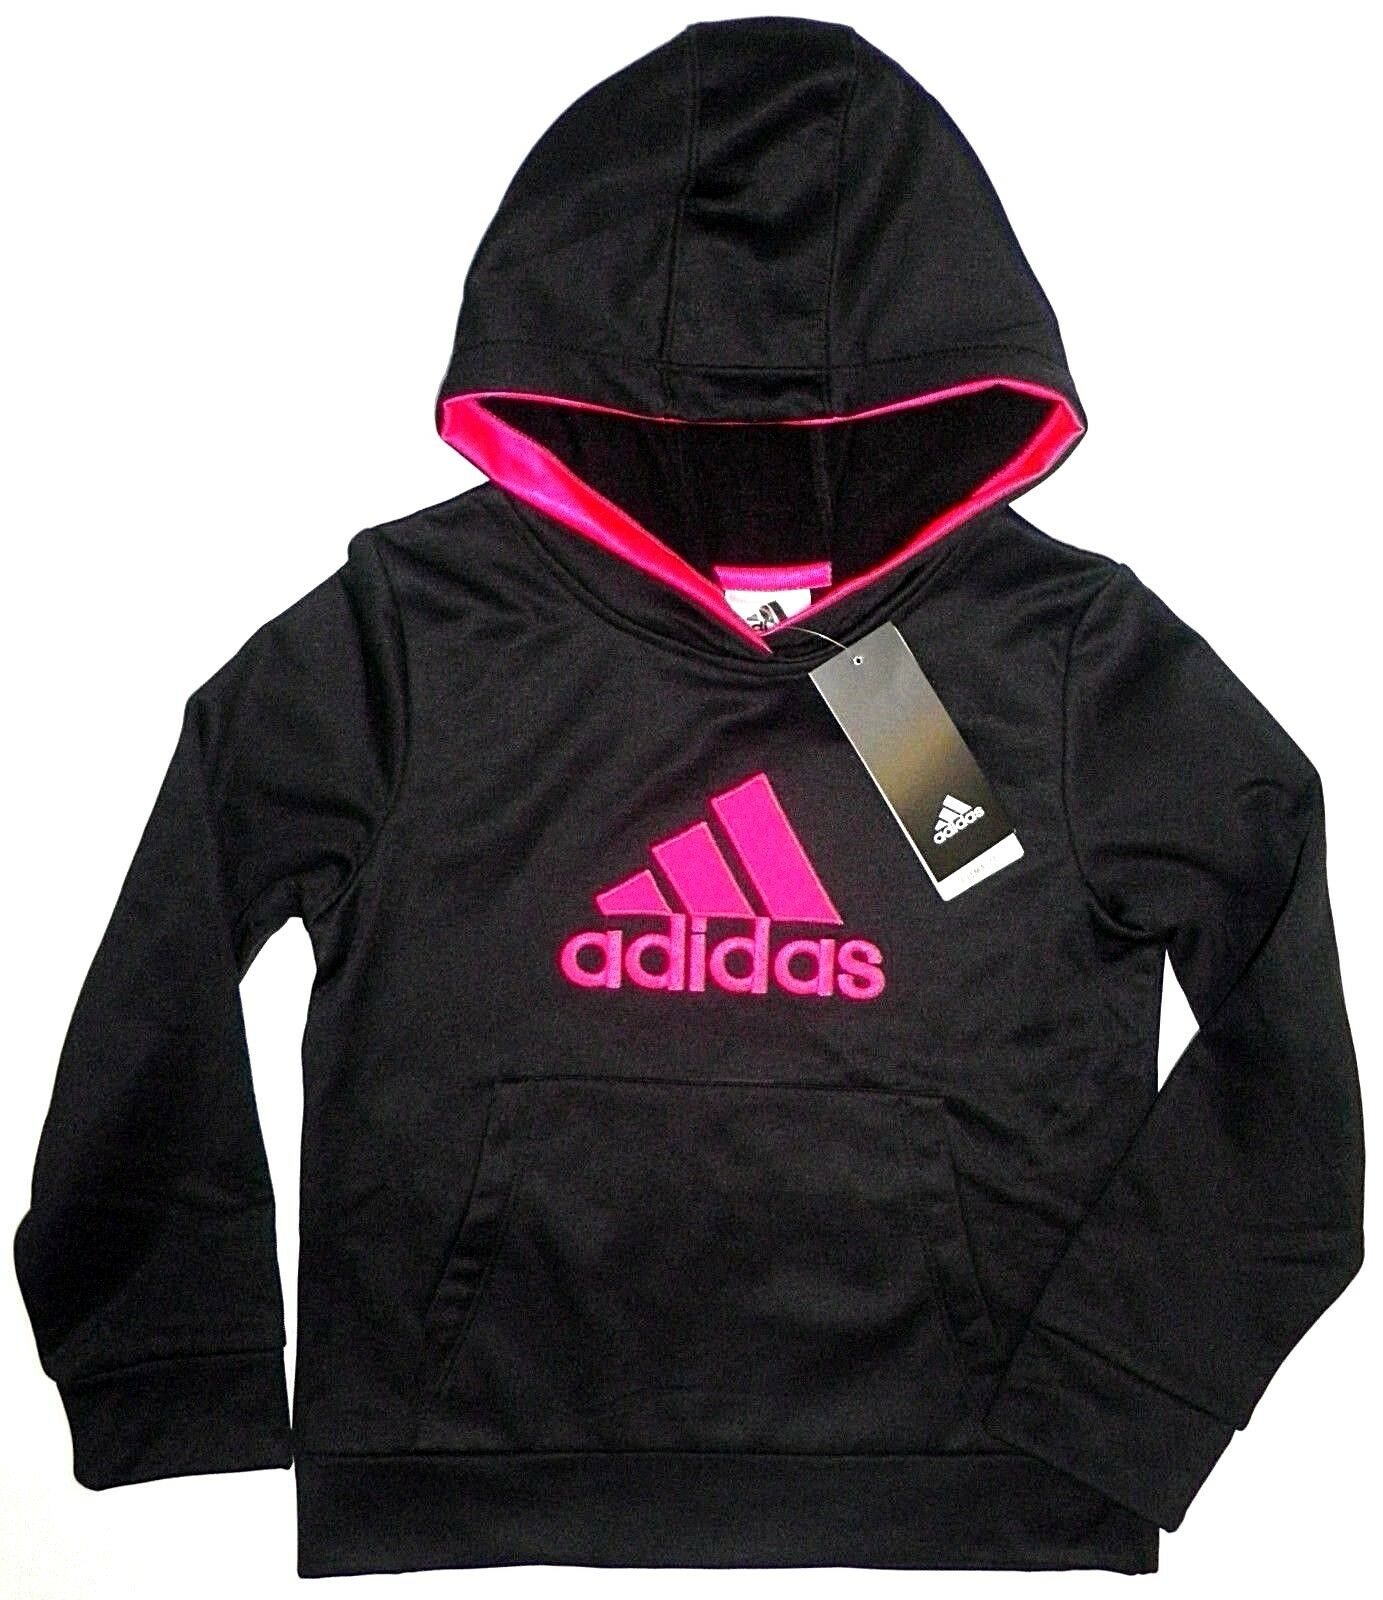 adidas Little Girls Pullover Fleece Lined Hoodie Sweatshirt Black Pink Kids 6